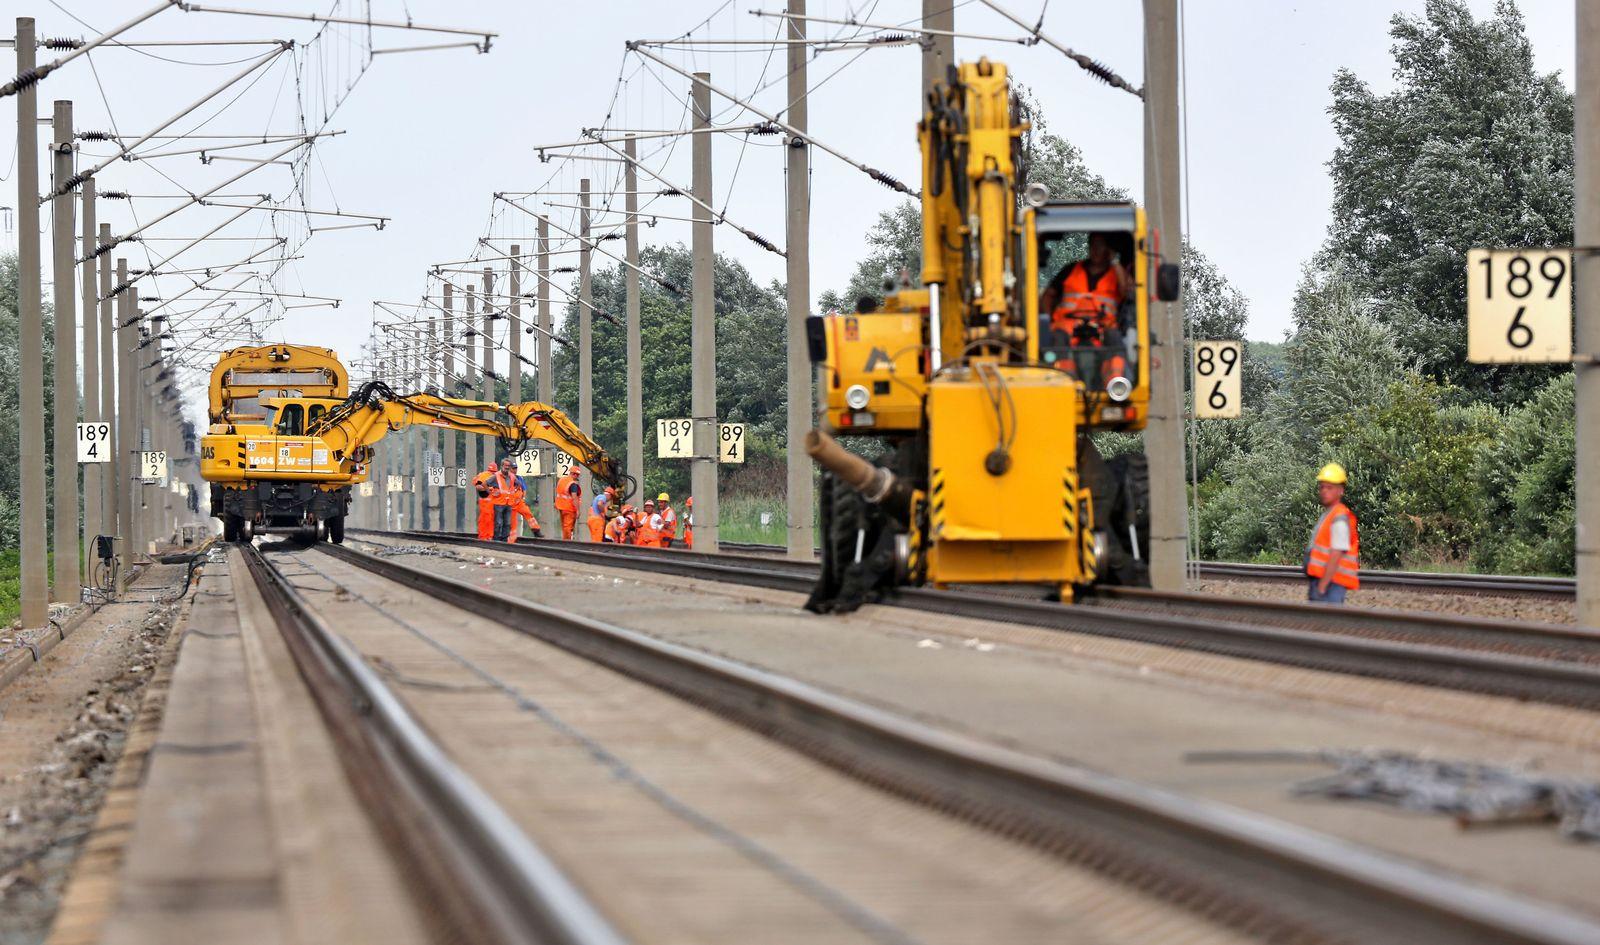 Bauarbeiten an ICE-Strecke Hannover-Berlin